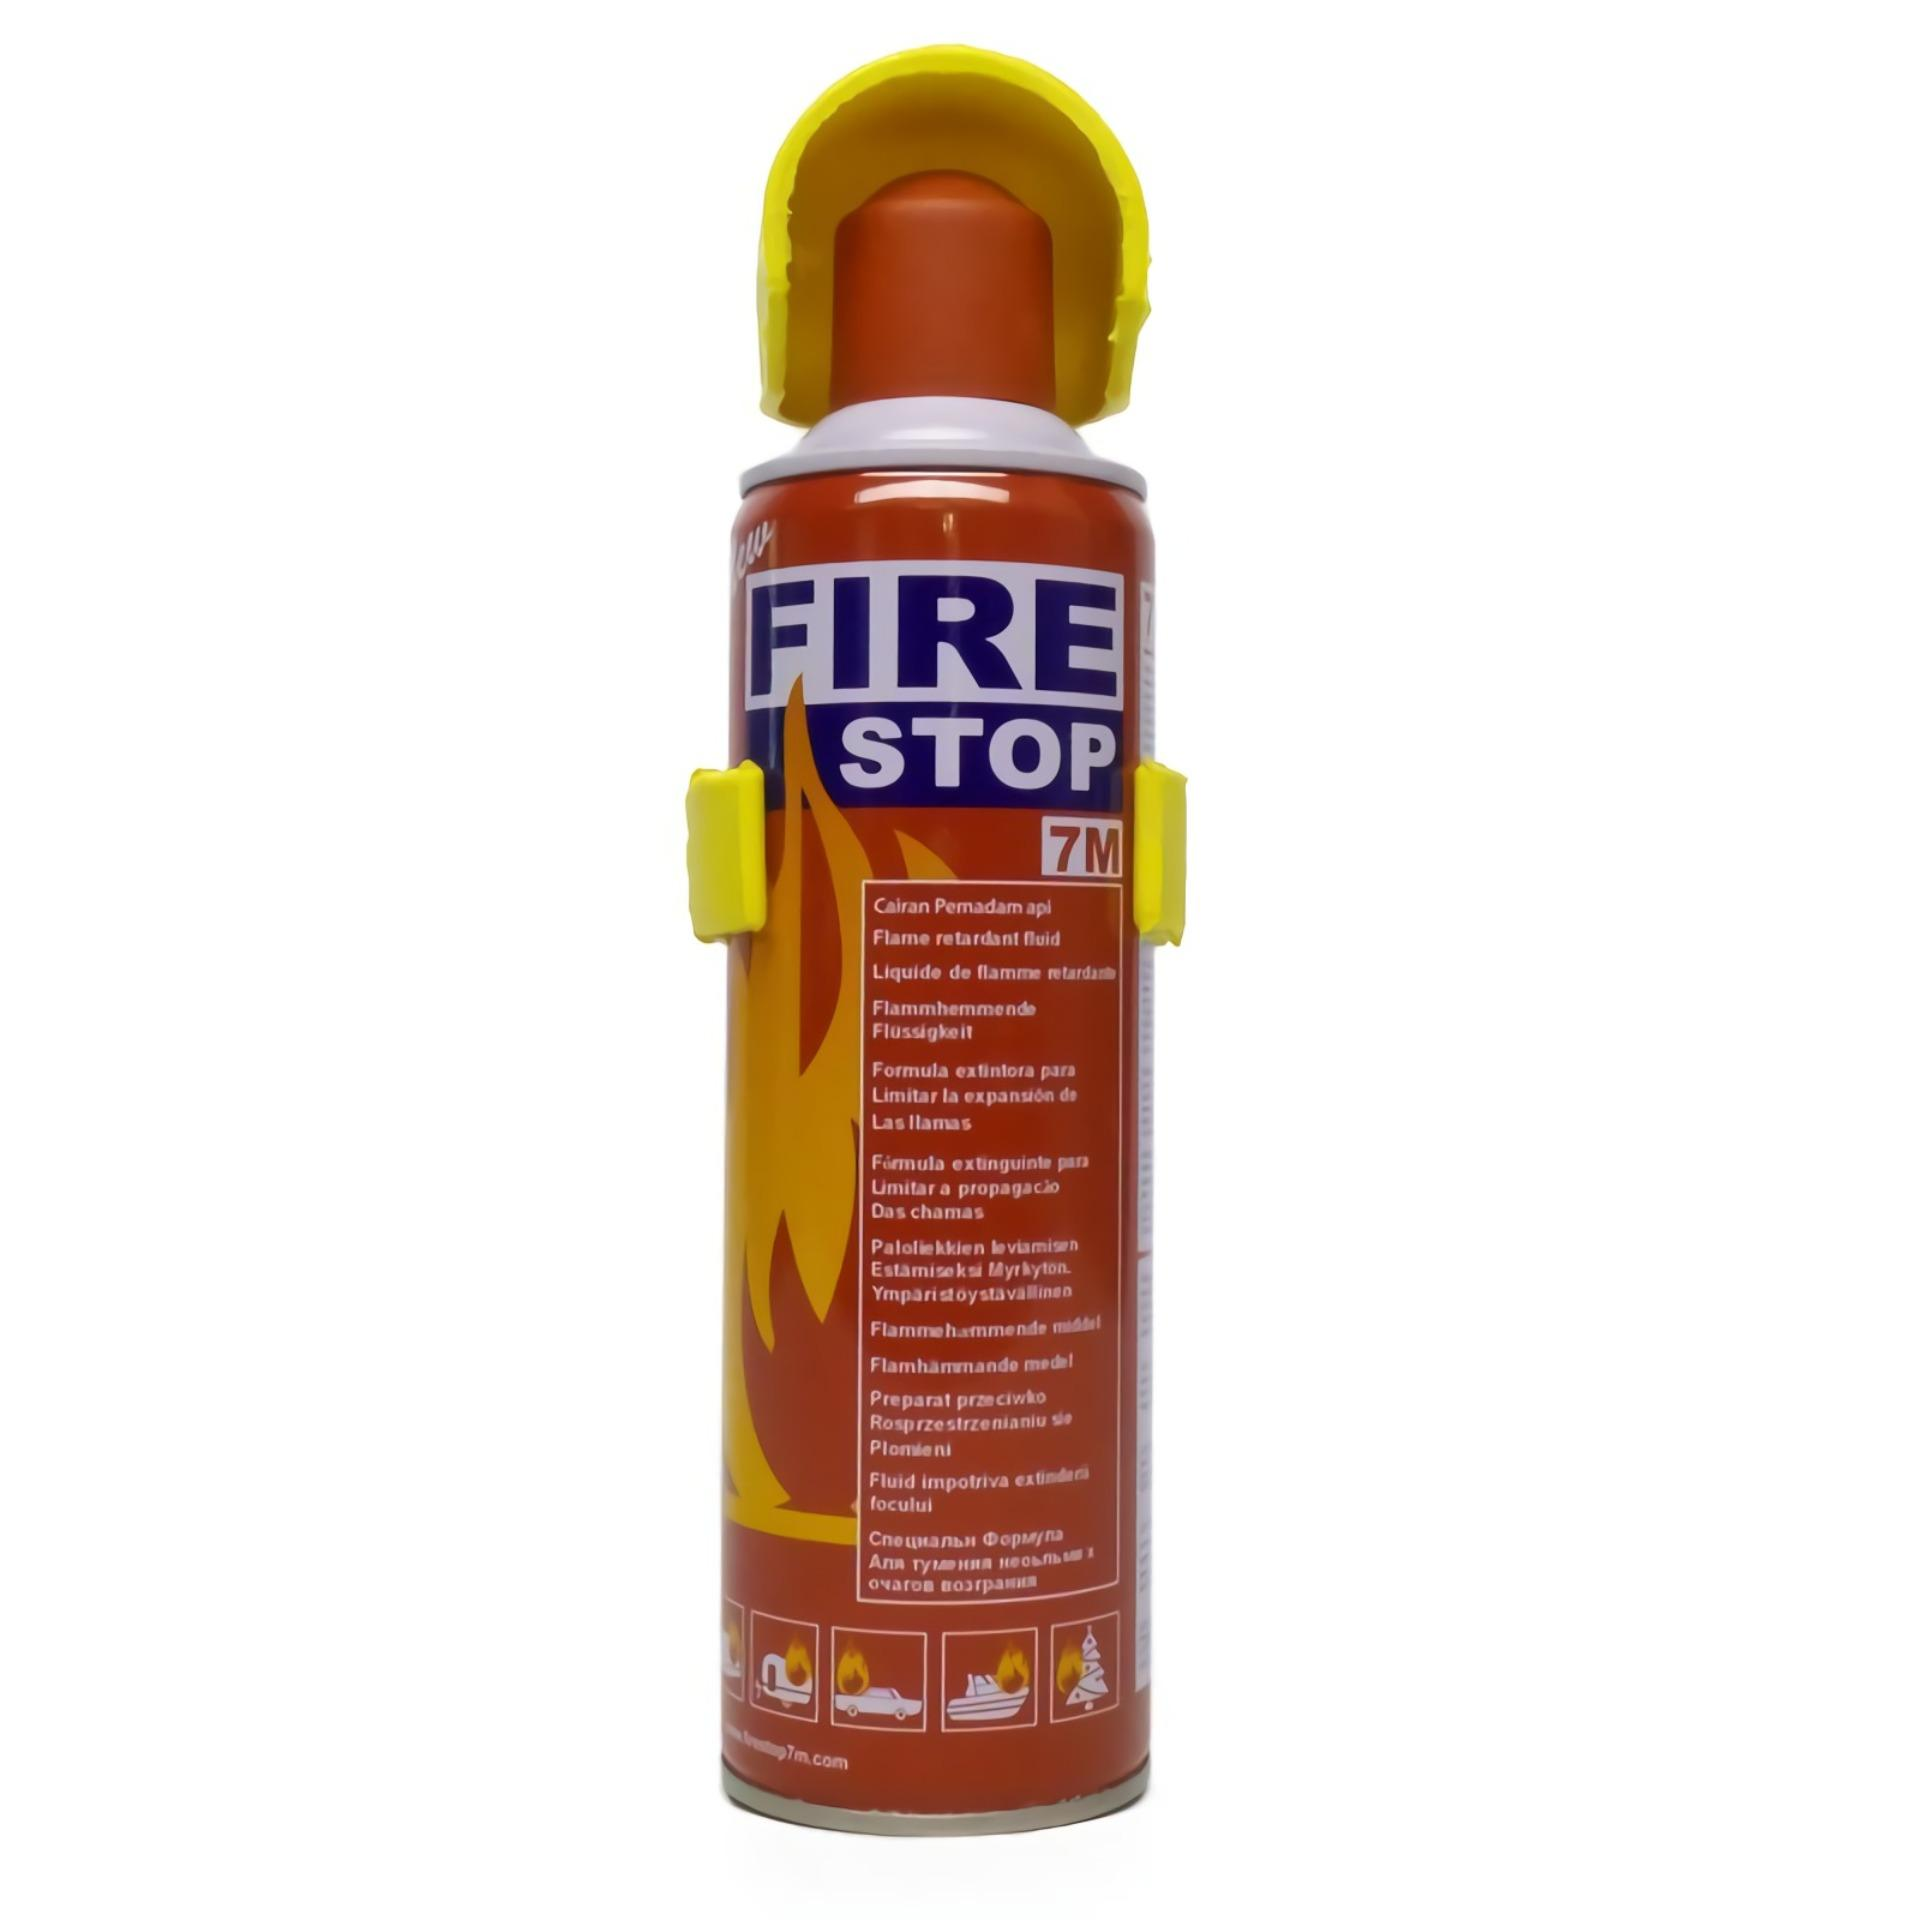 Setir Mobil Aksesoris Bantal Pelindung Kepala Otomobil Pemadam Api Tox Fire Stop Racun Portabel 400 Ml Extinguisher